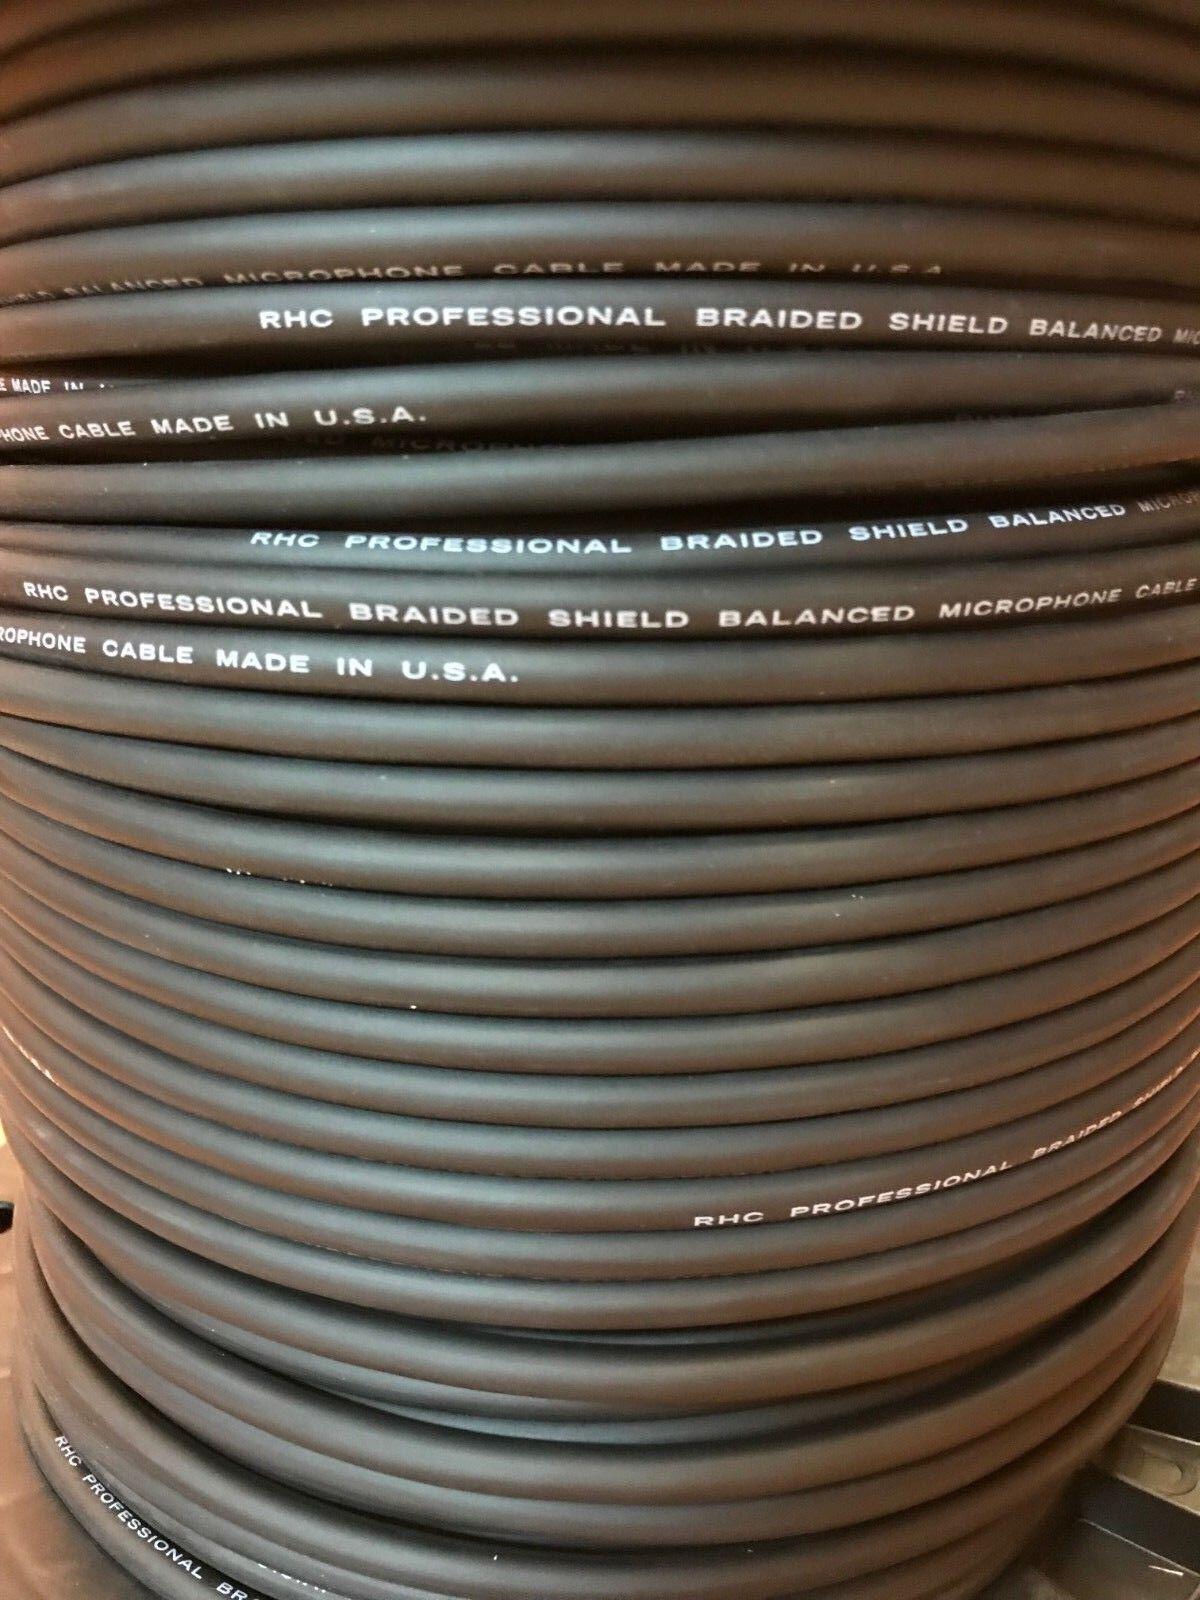 Horizon LO-Z5 MIC5.K 20 GA HIGH PERFORMANCE Microphone Bulk Cable 250 ft US-MADE